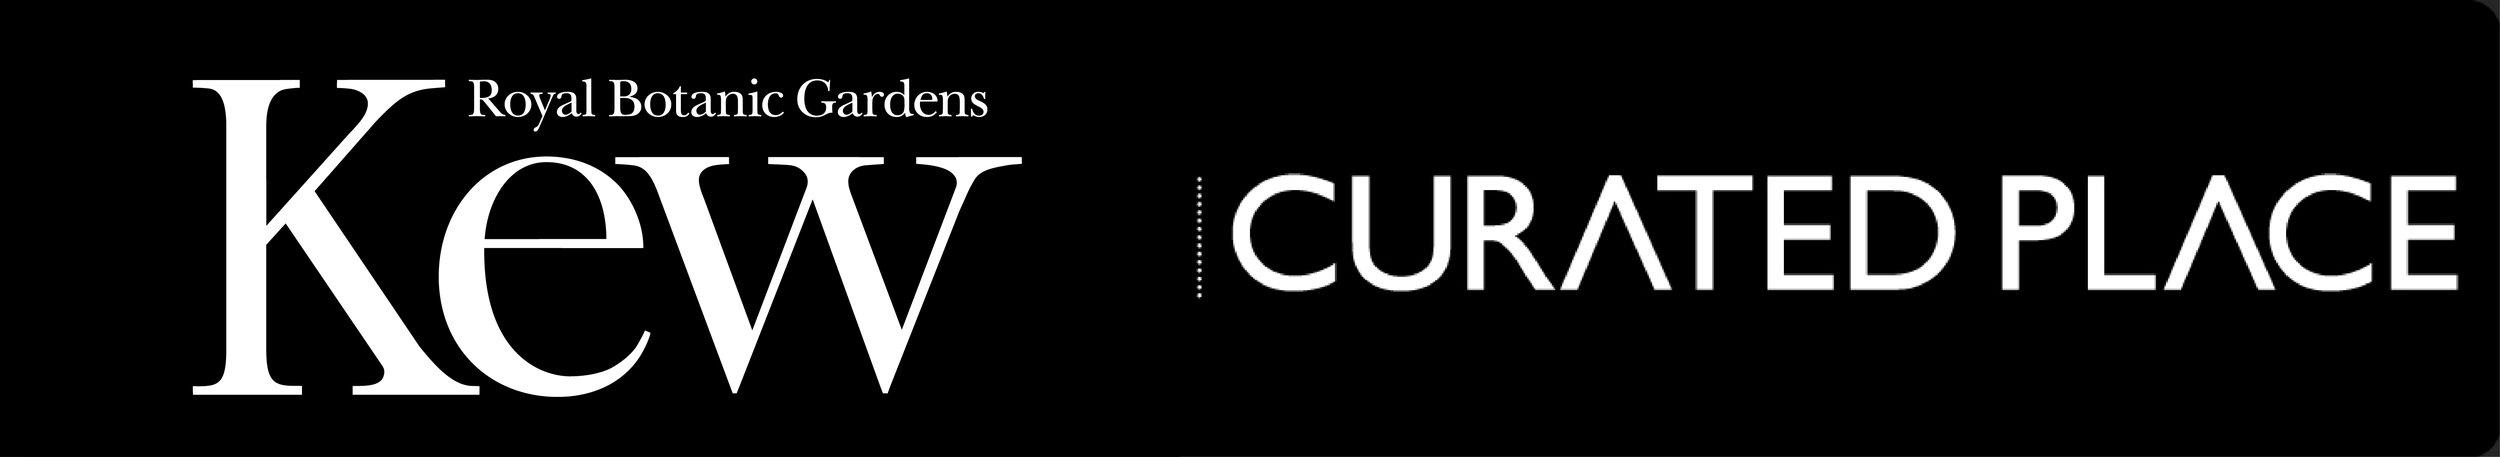 CuratedPlace-KEW-logo.jpg